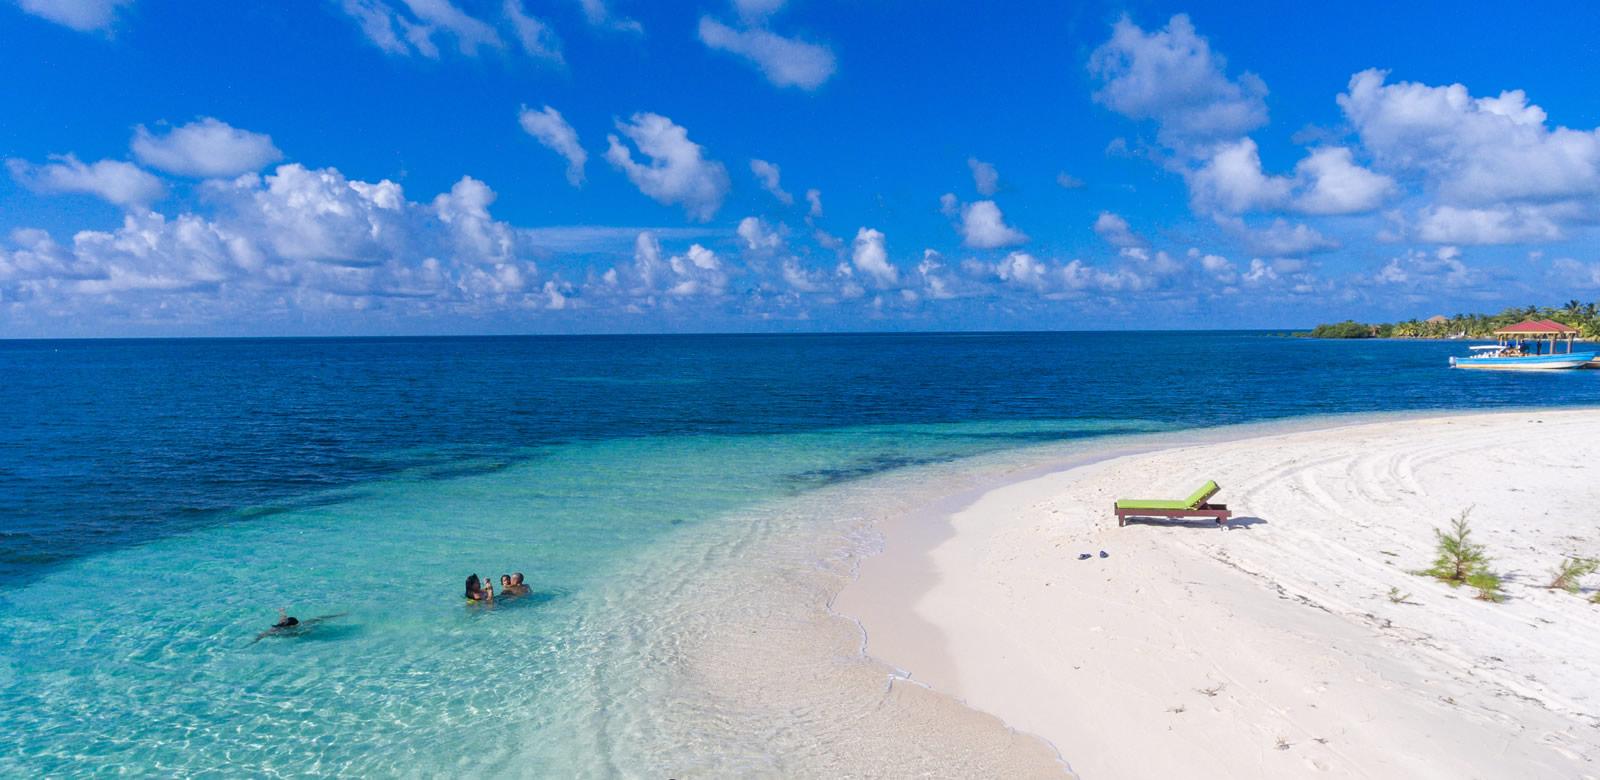 Manta Island Belize - Aerial Image